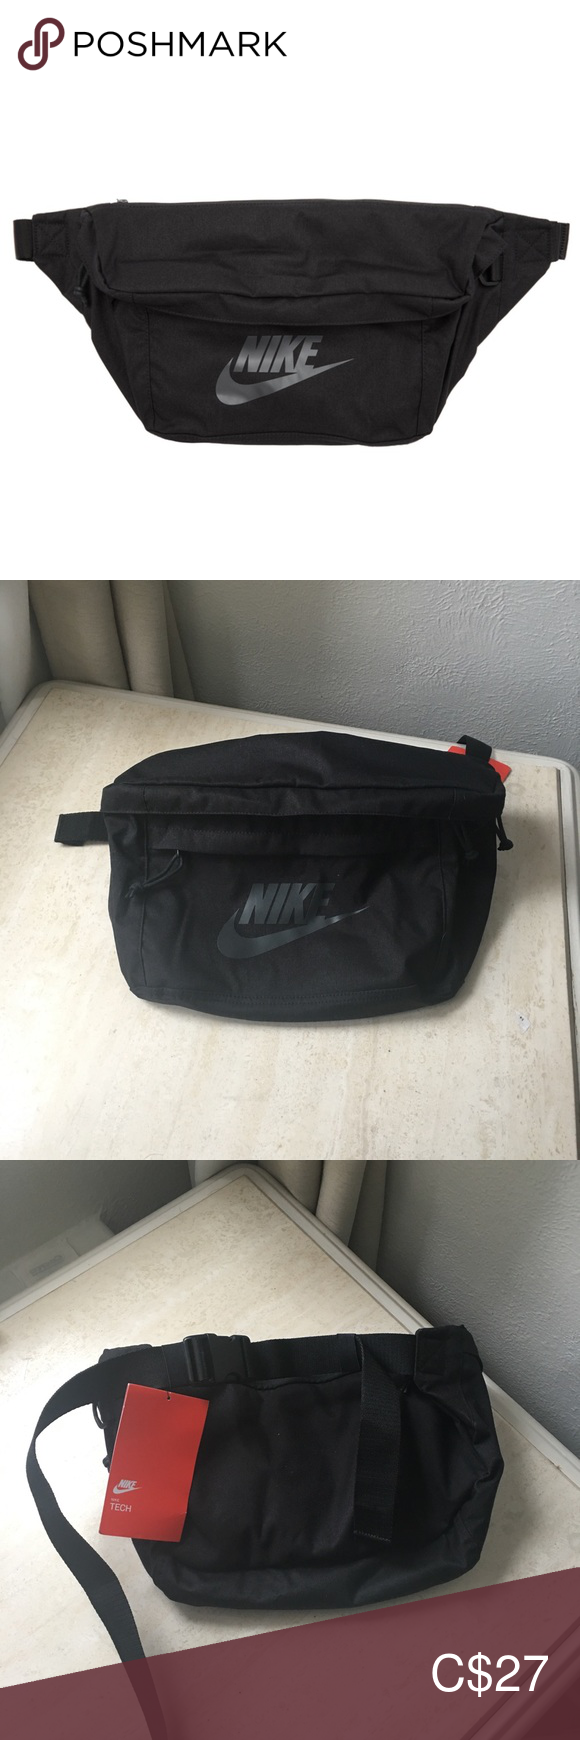 Nike grey waist bag in 2020 Nike tech, Nike, Bugatti bag